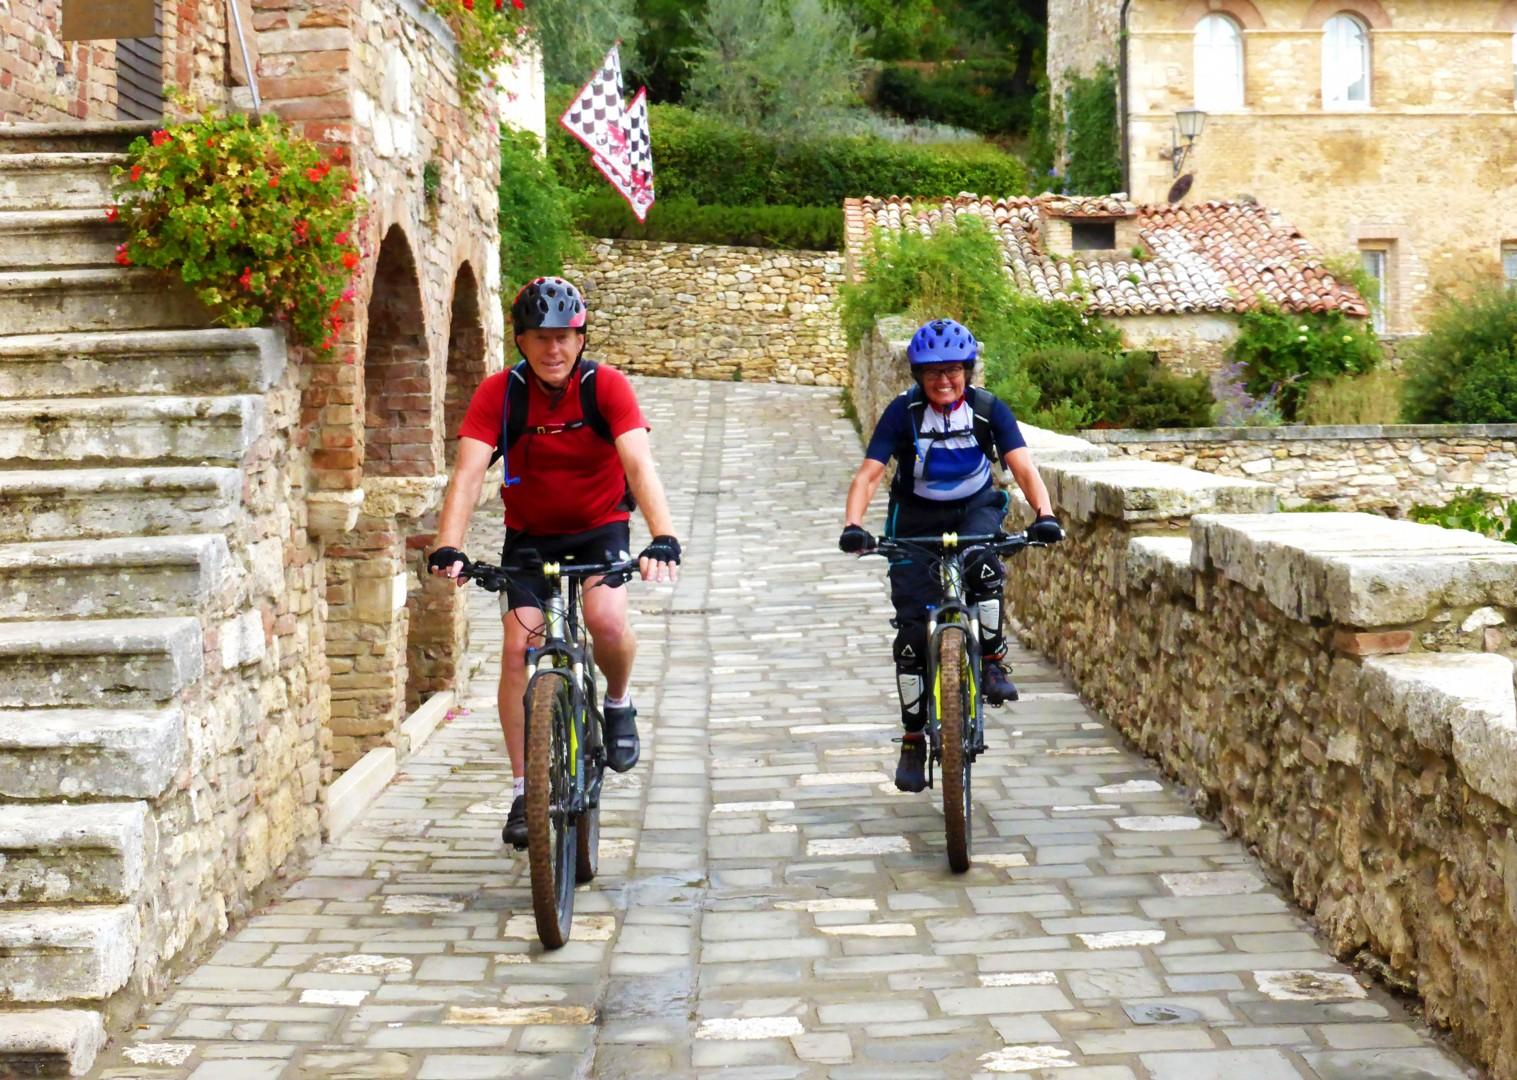 saddle-skedaddle-italy-tuscany-to-rome-mountain-bike-self-guided.jpg - Italy - Via Francigena (Tuscany to Rome) - Self-Guided Mountain Bike Holiday - Mountain Biking